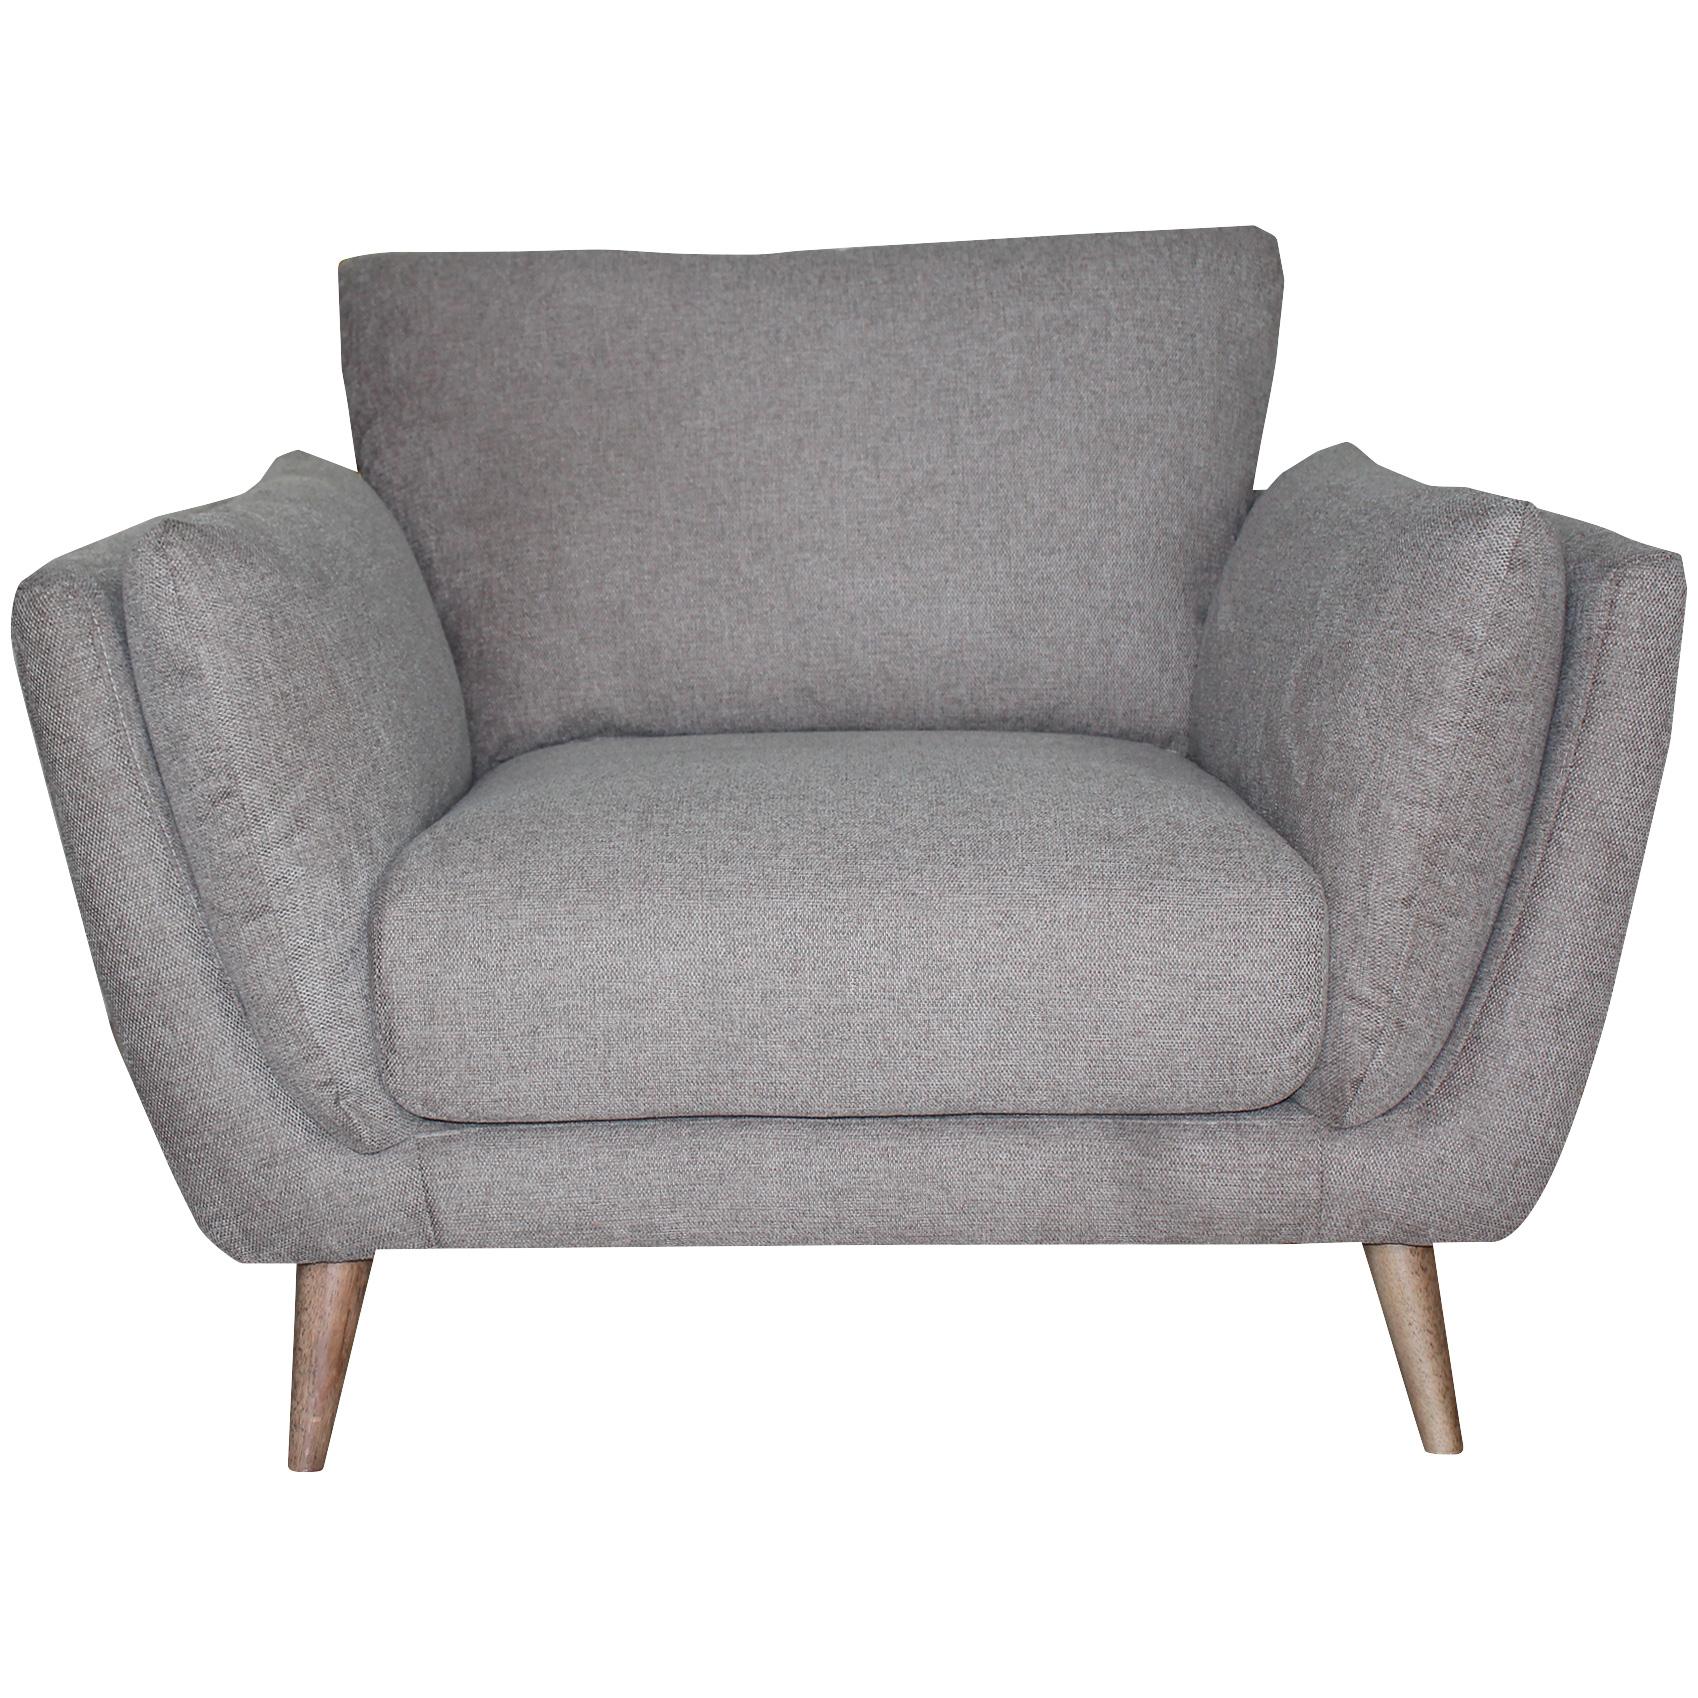 Urban Chic Upholstery | Lydia Mushroom Chair